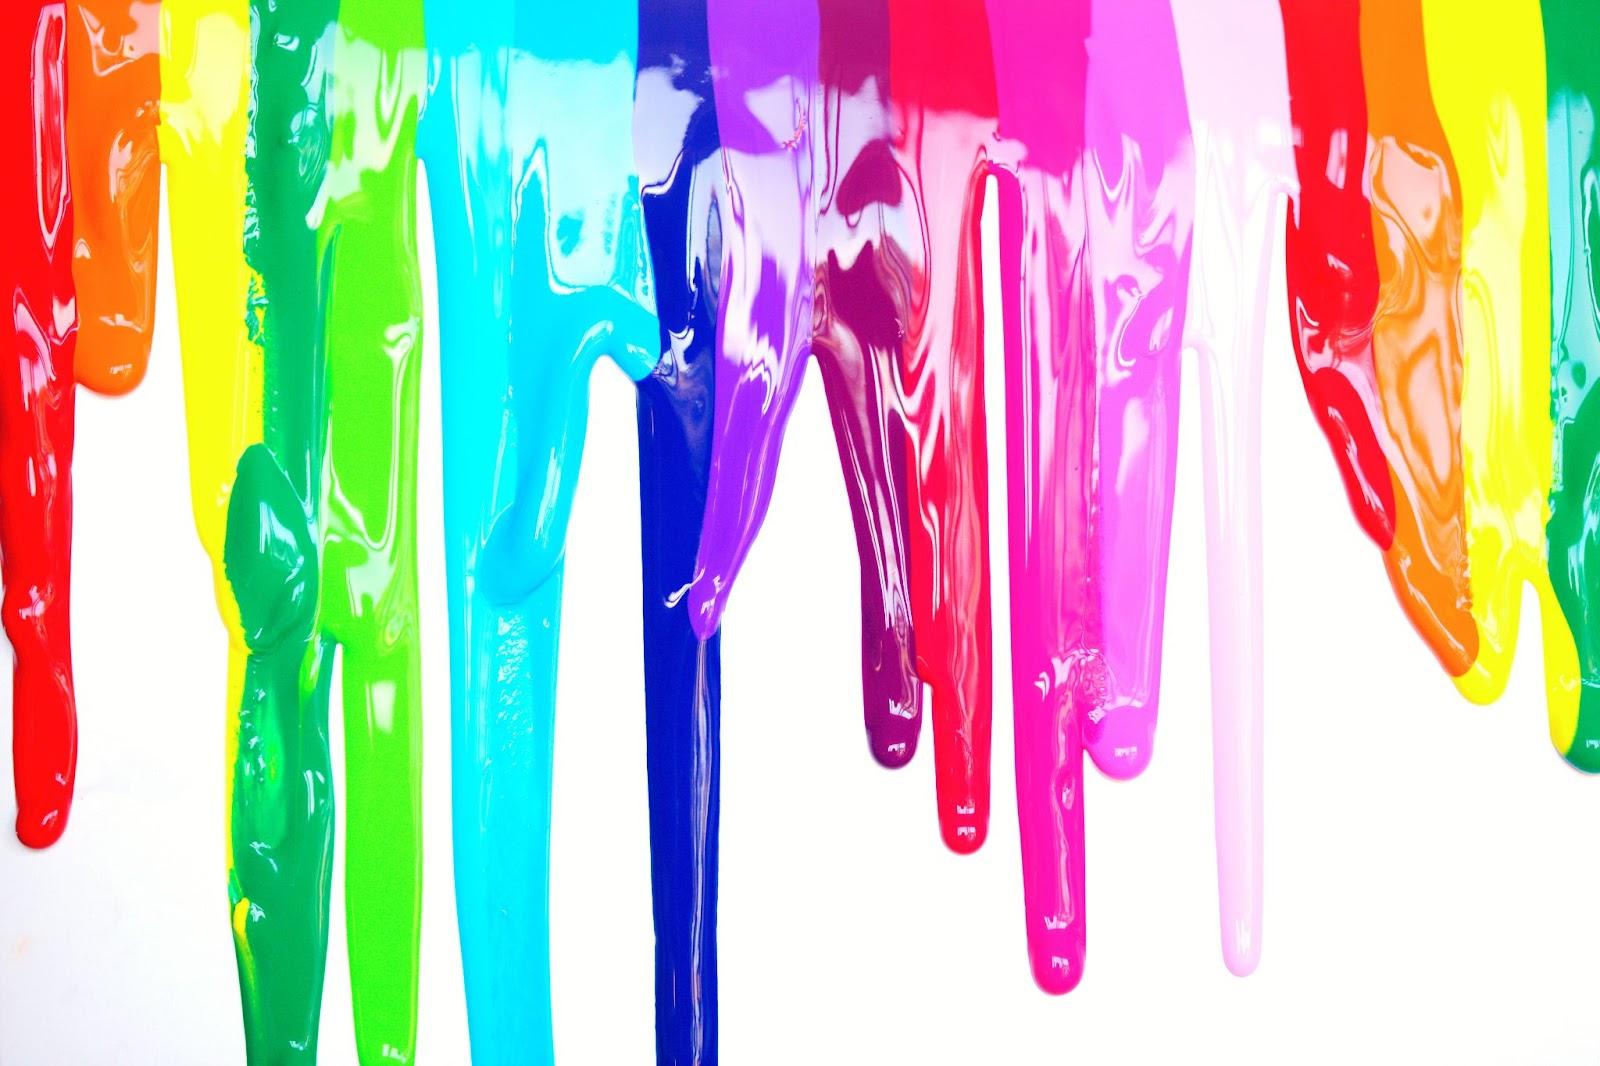 colorful picture